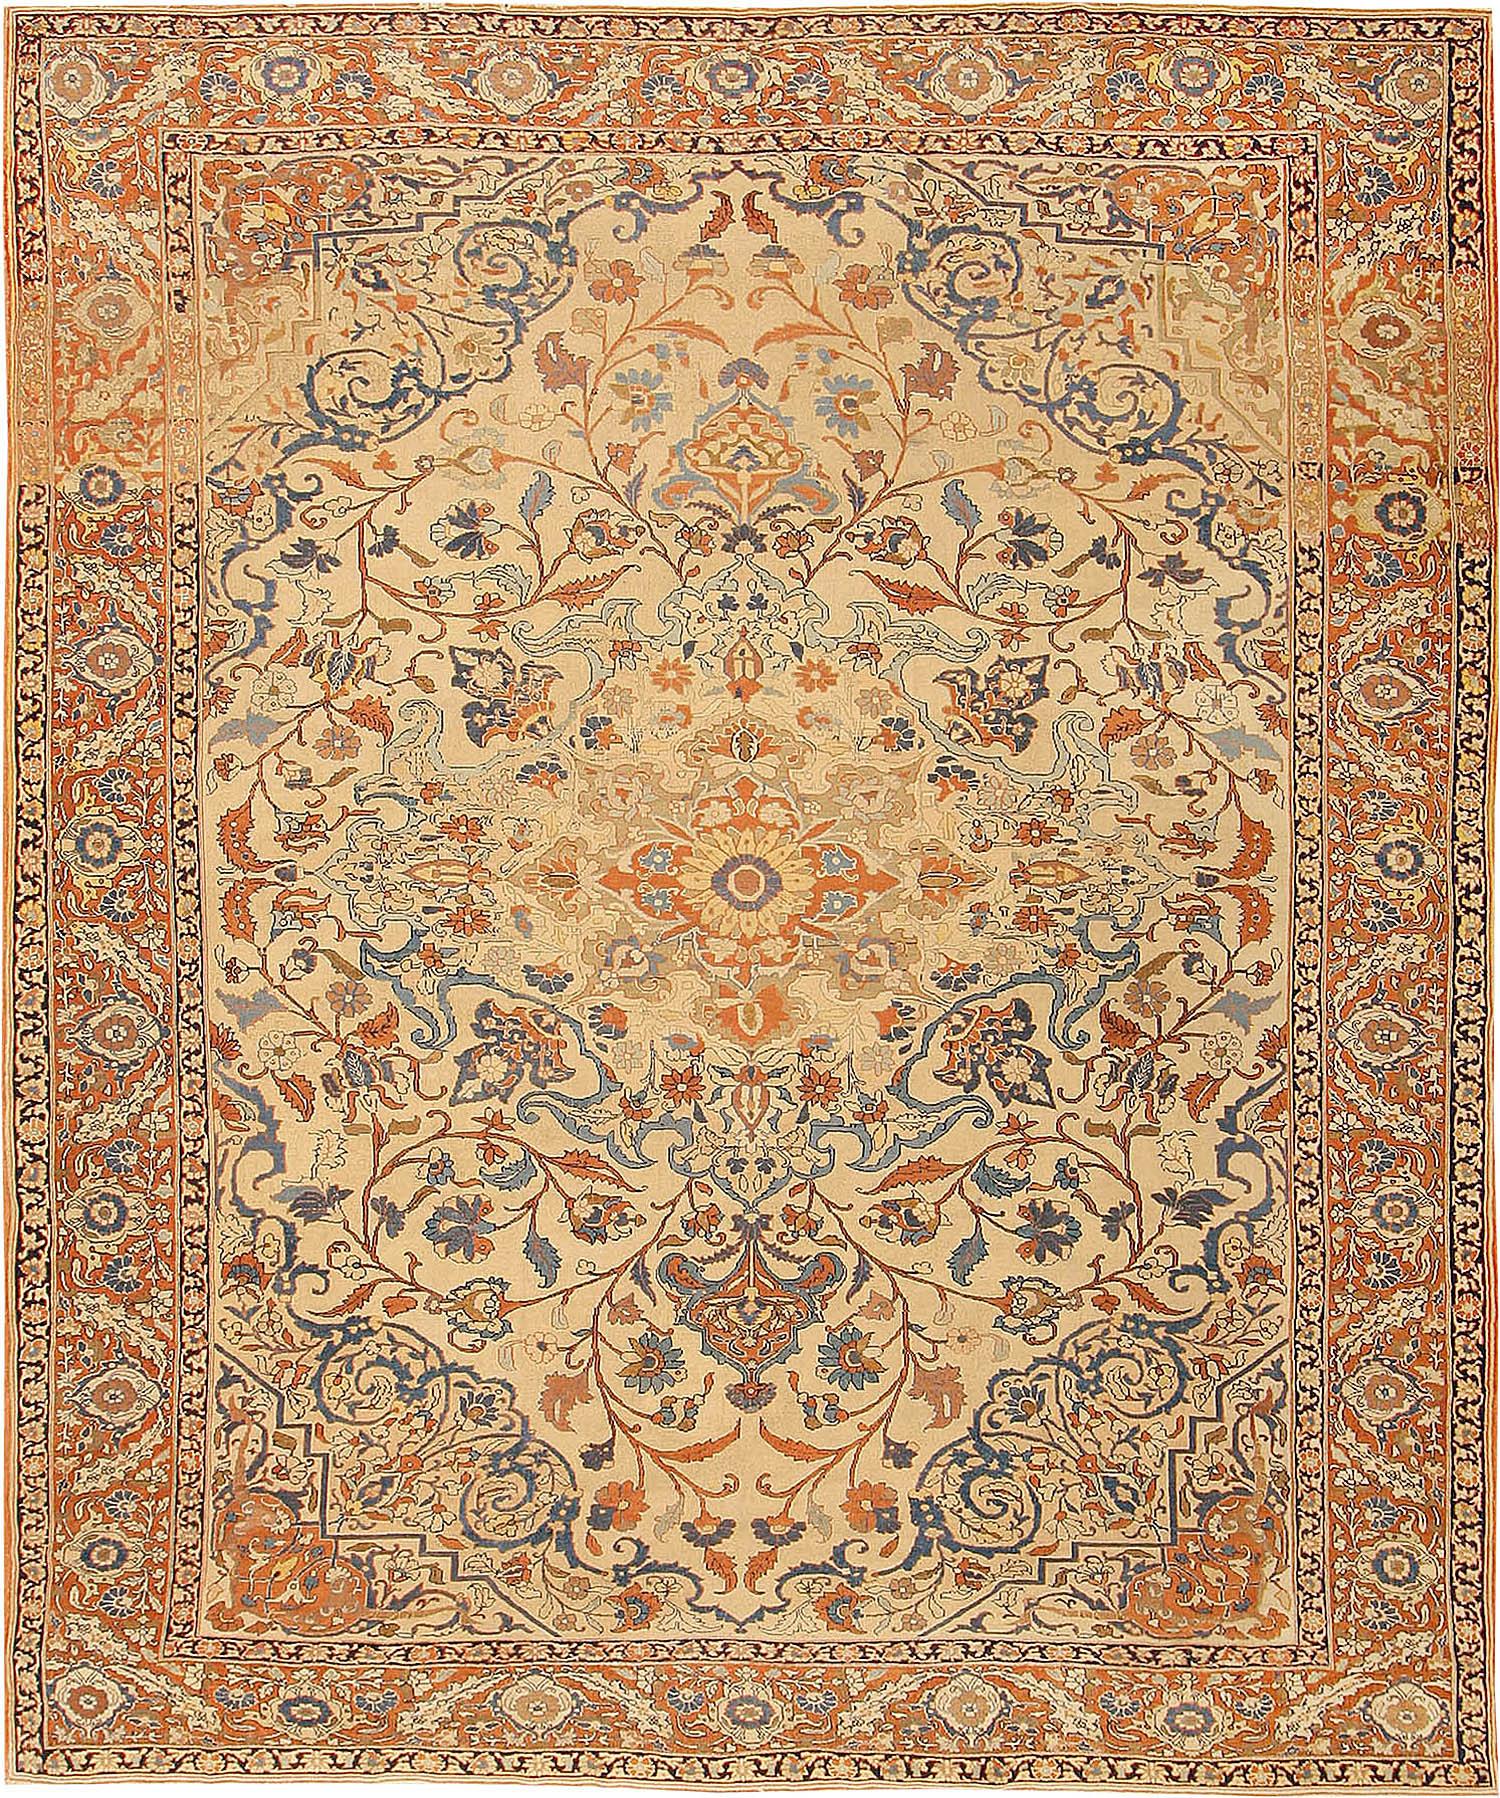 Antique Tabriz Persian Rug 41890 For Sale